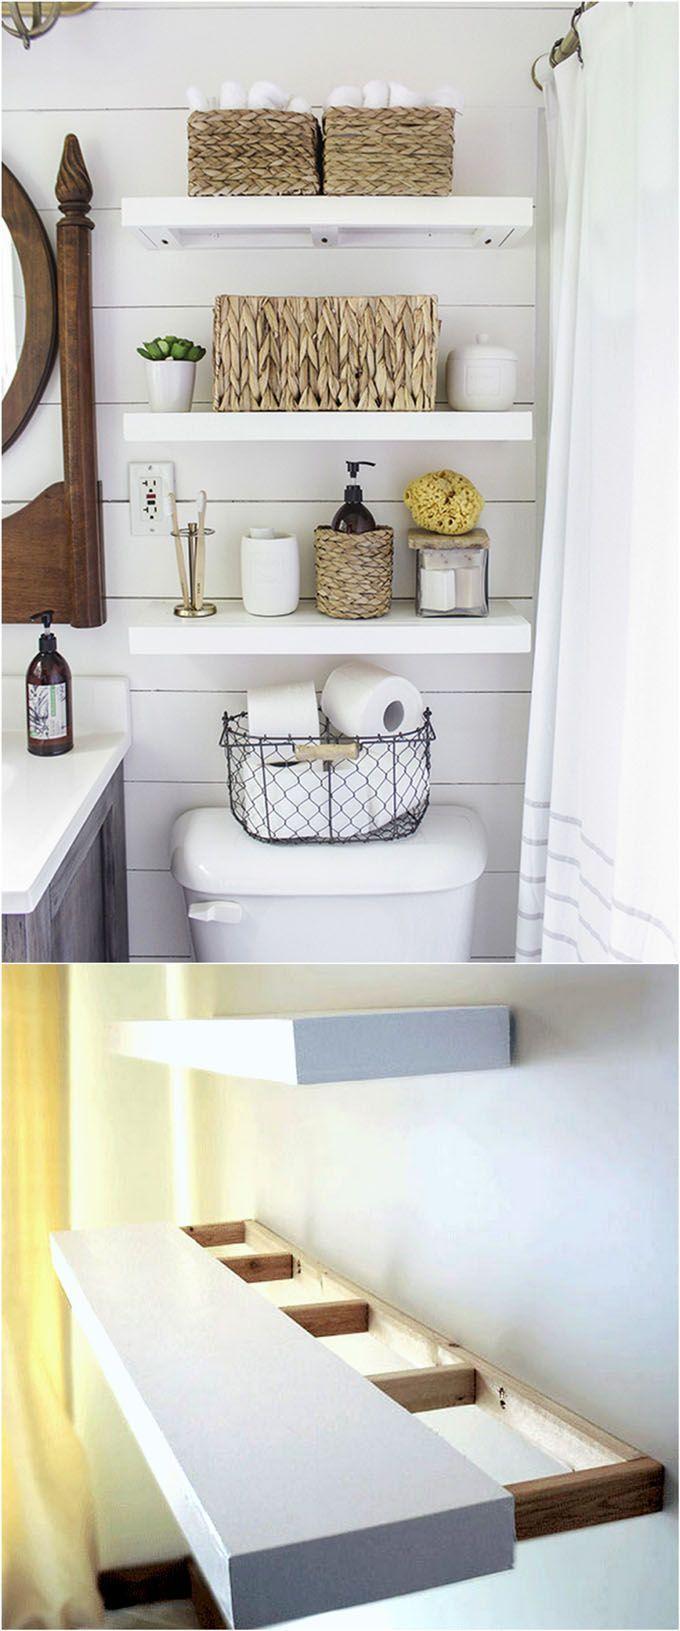 306 best Bathroom Storage Ideas images on Pinterest | Basket ...